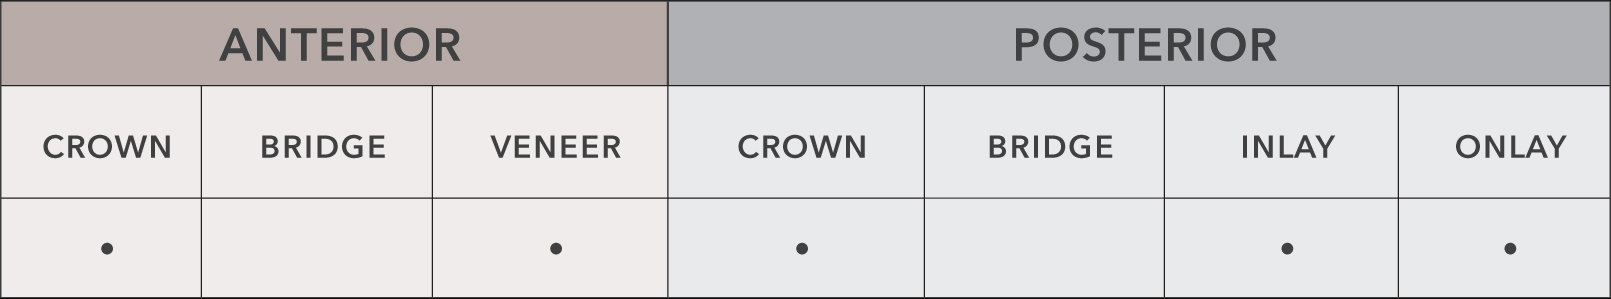 emax chart